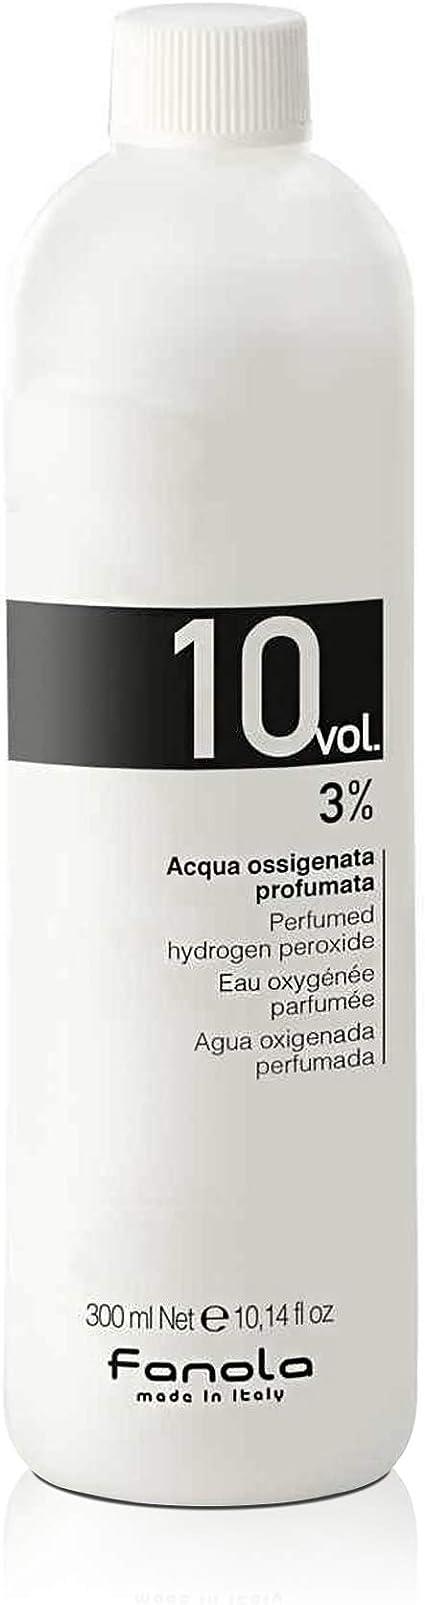 Fanola Oxigenada 10 VOL 3% 300 mL